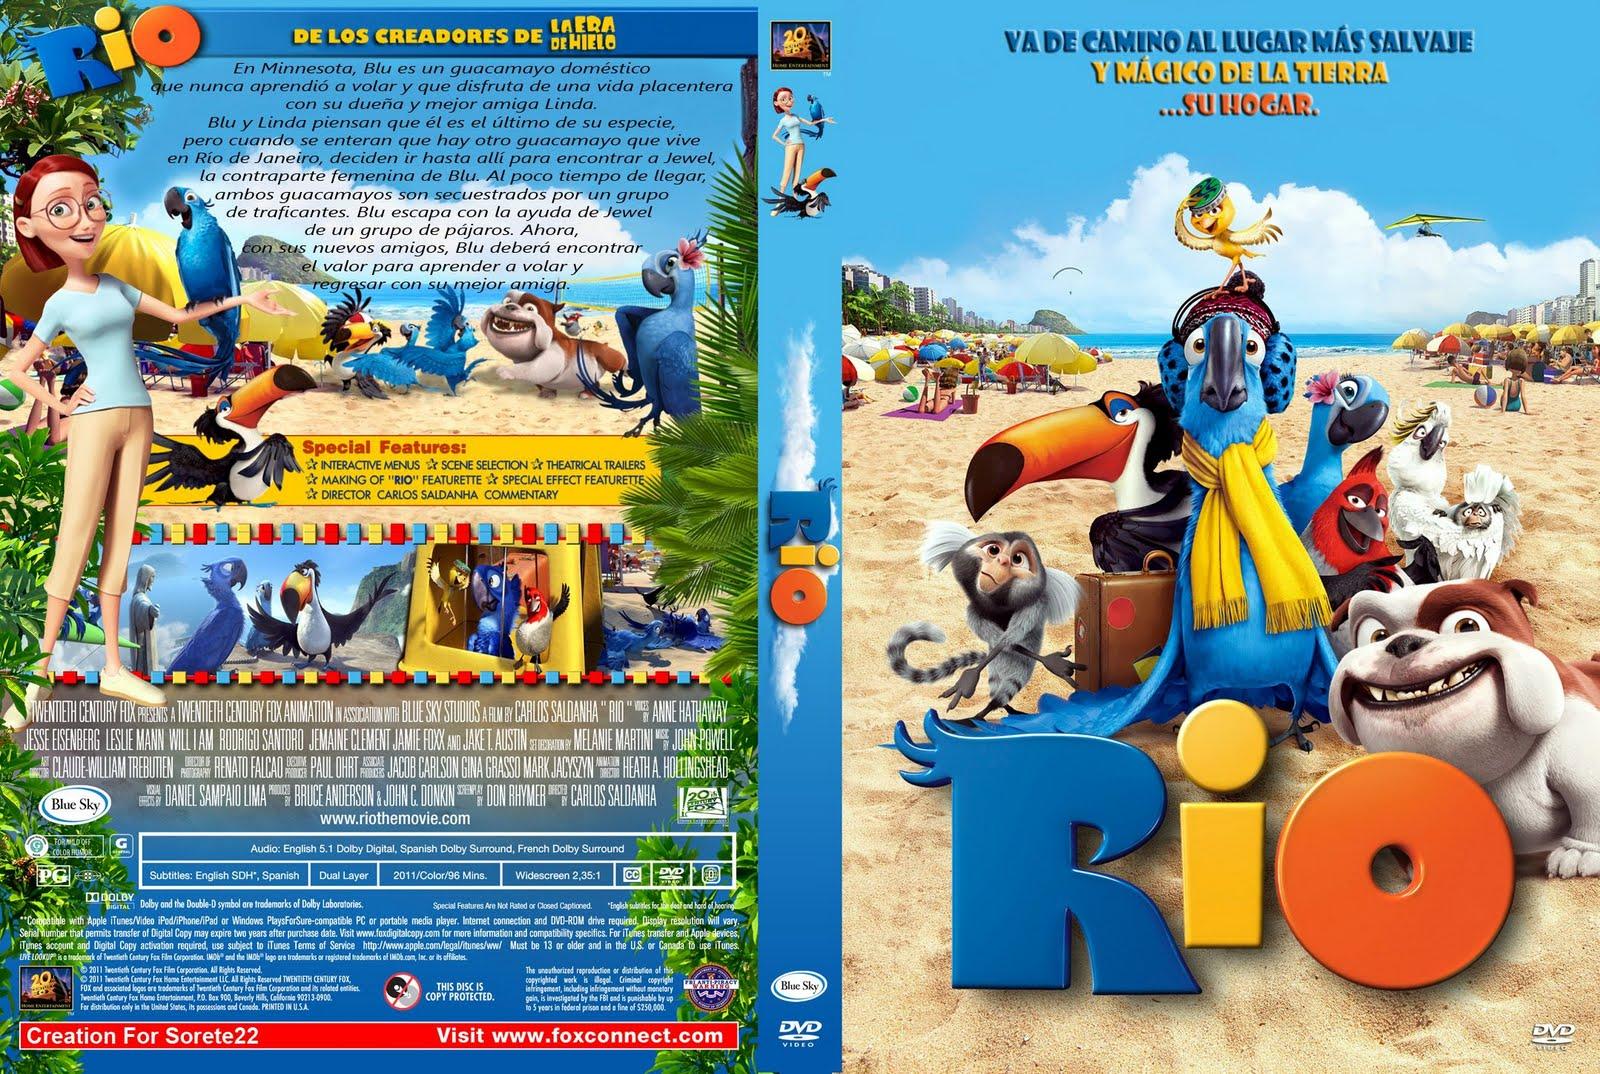 http://3.bp.blogspot.com/-3fxJCA0oZ78/TgumBeZAvQI/AAAAAAAAAC4/lWXrb4nMvC4/s1600/Rio+Custom+V4+Por+Sorete22+-+dvd.jpg